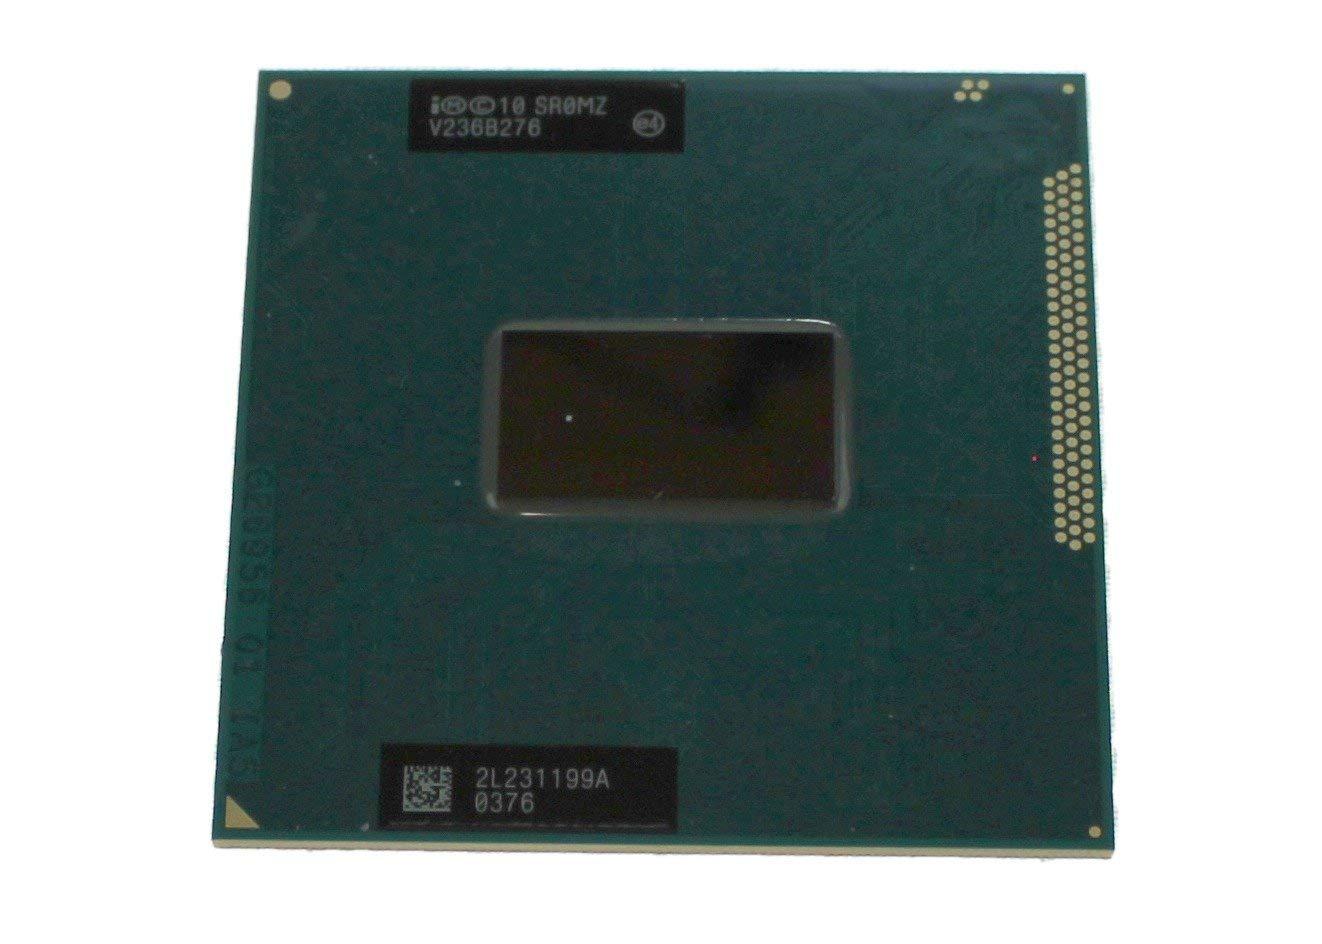 Renewed Intel Core i5-3210M SR0MZ Mobile CPU Processor Socket G2 PGA988B 2.5Ghz 3MB 5 GT//s